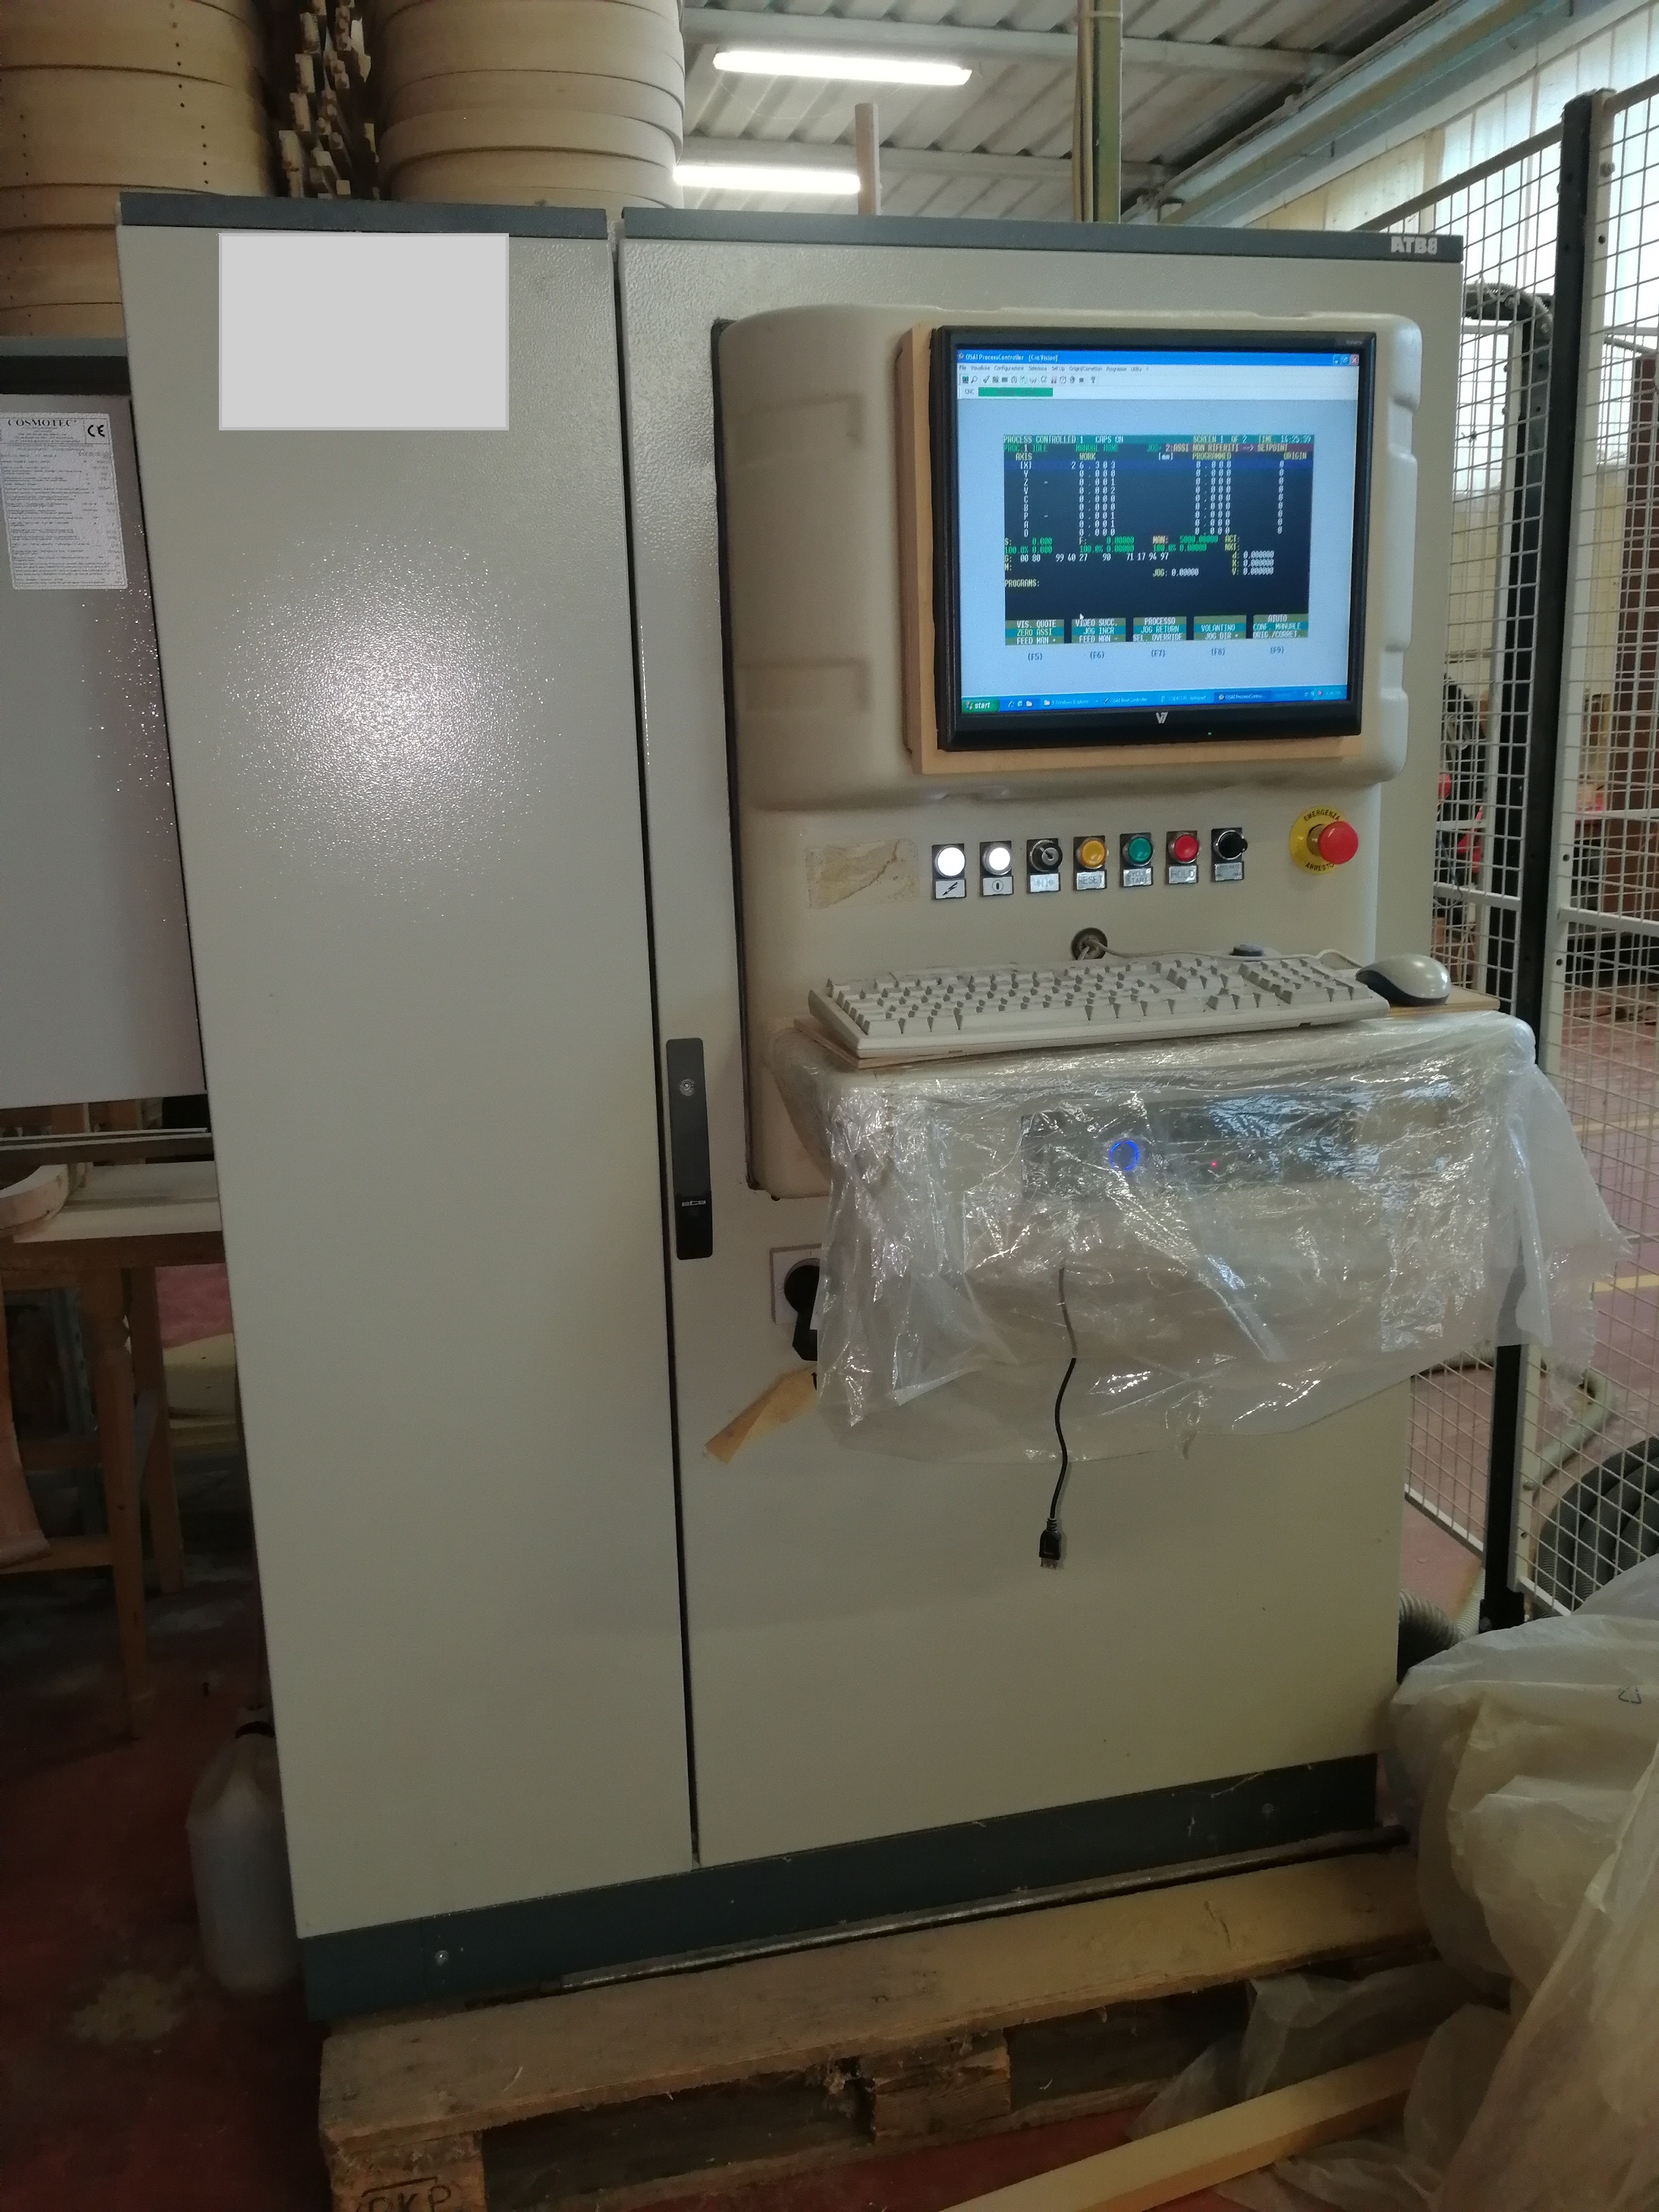 CNC DOPPIA TESTA 5 ASSI - UNITEAM MAJOR 2R/6016-430 in vendita - foto 5